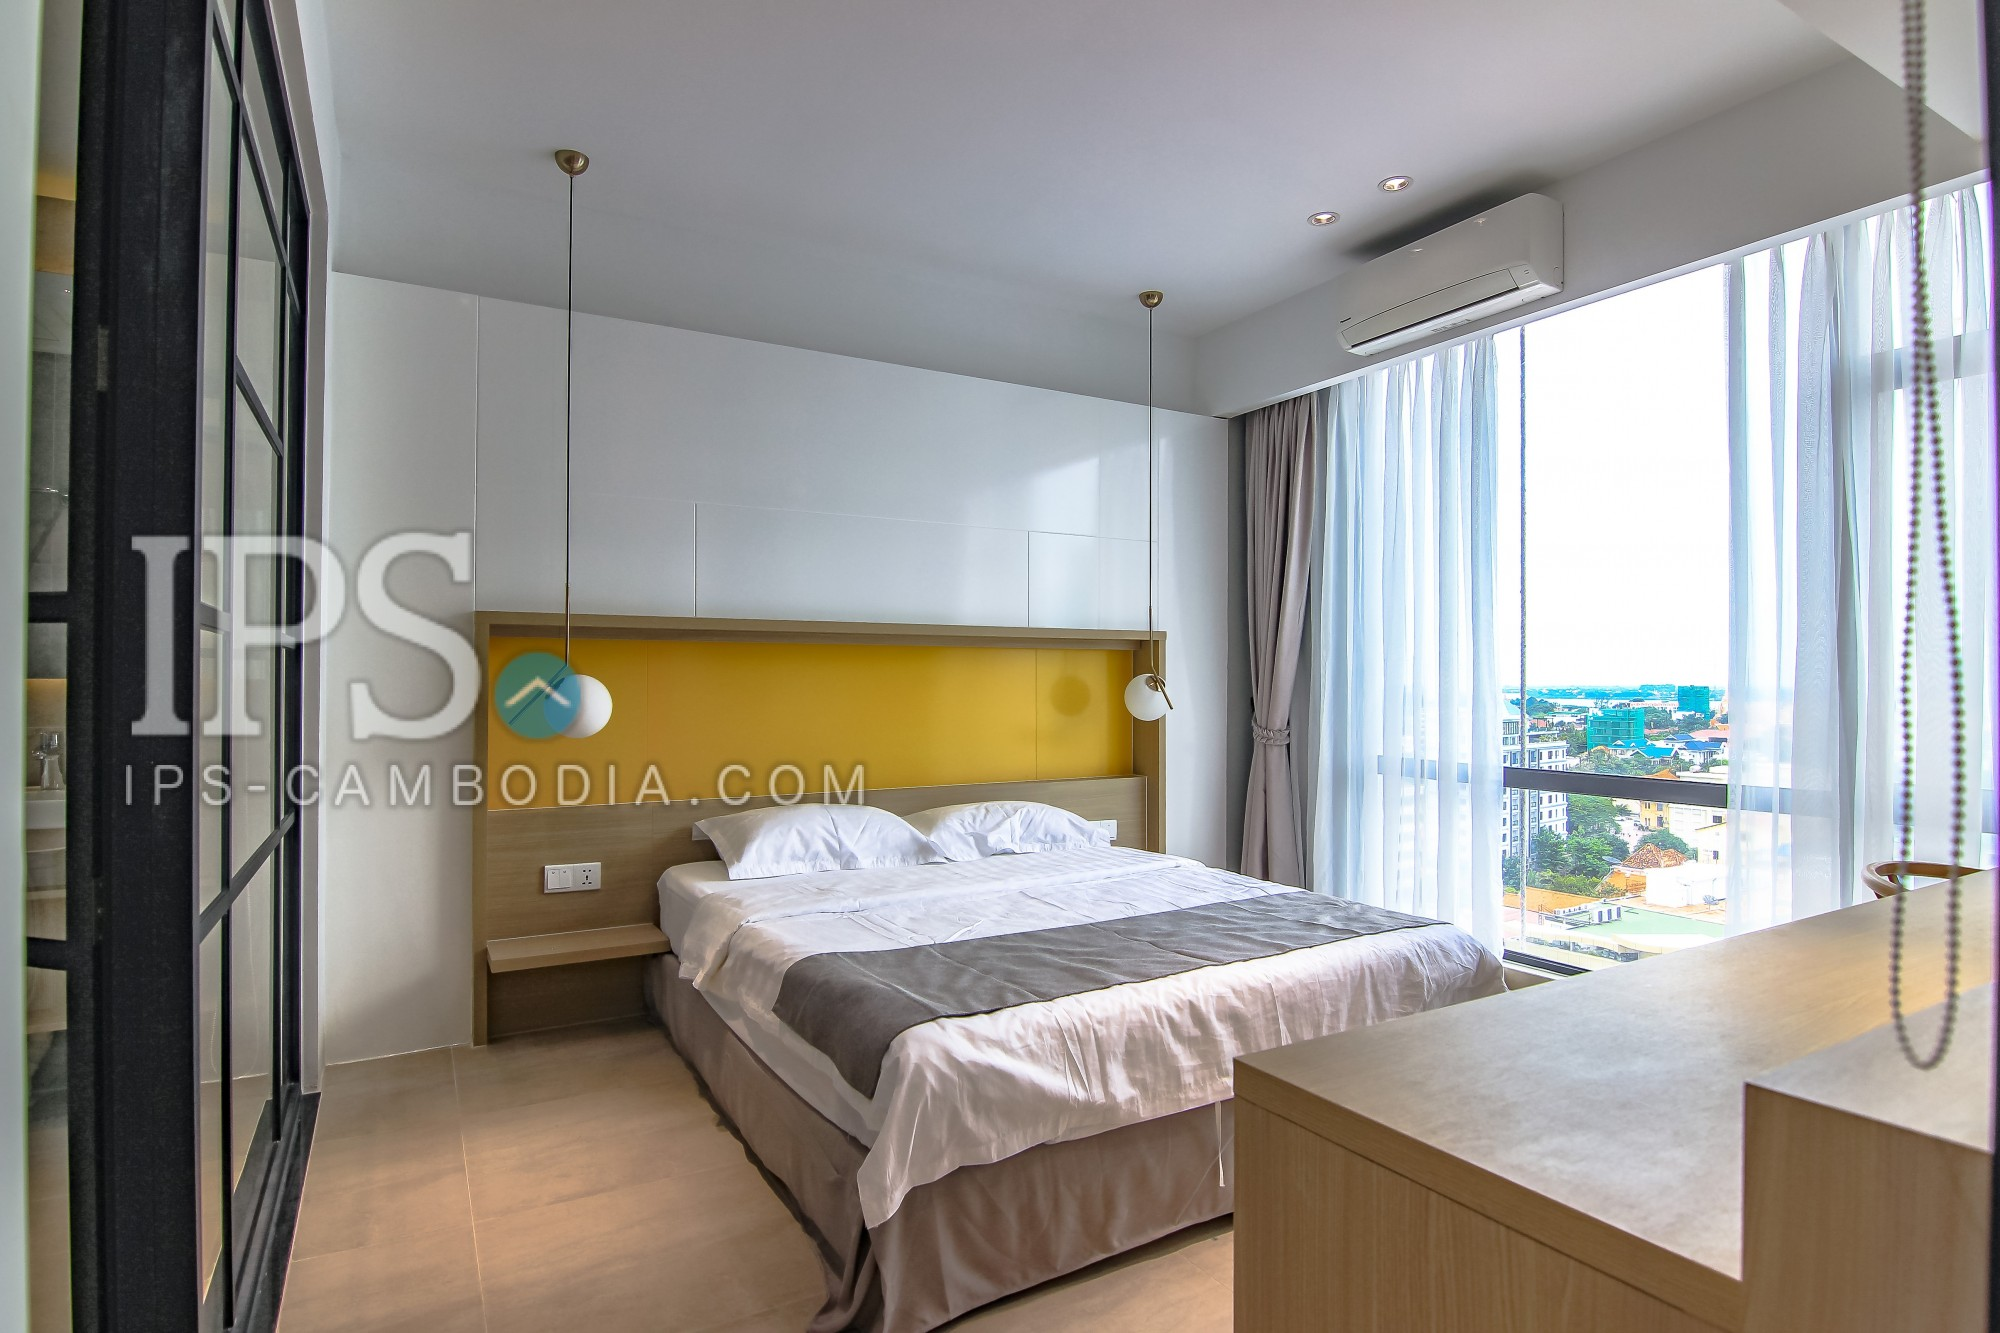 47 Sqm 1 Bedroom Apartment for Rent - BKK1